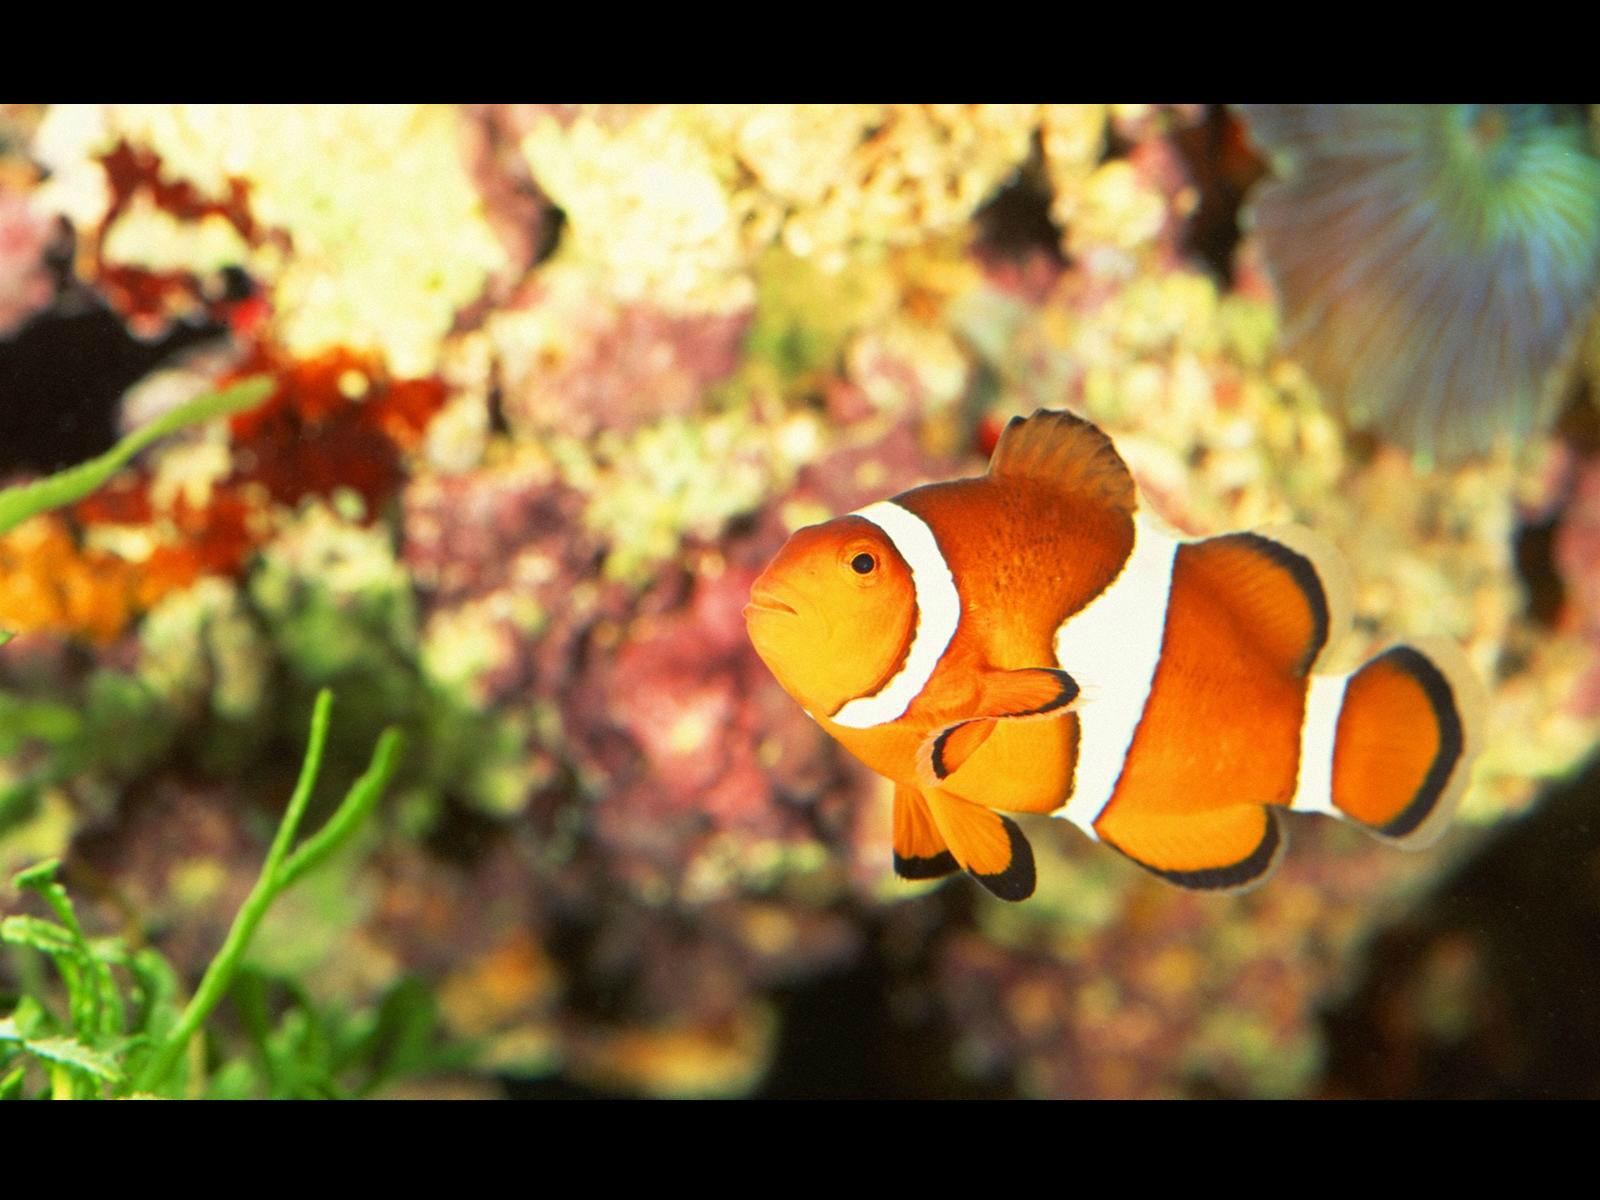 Clownfish Wallpaper HD Download